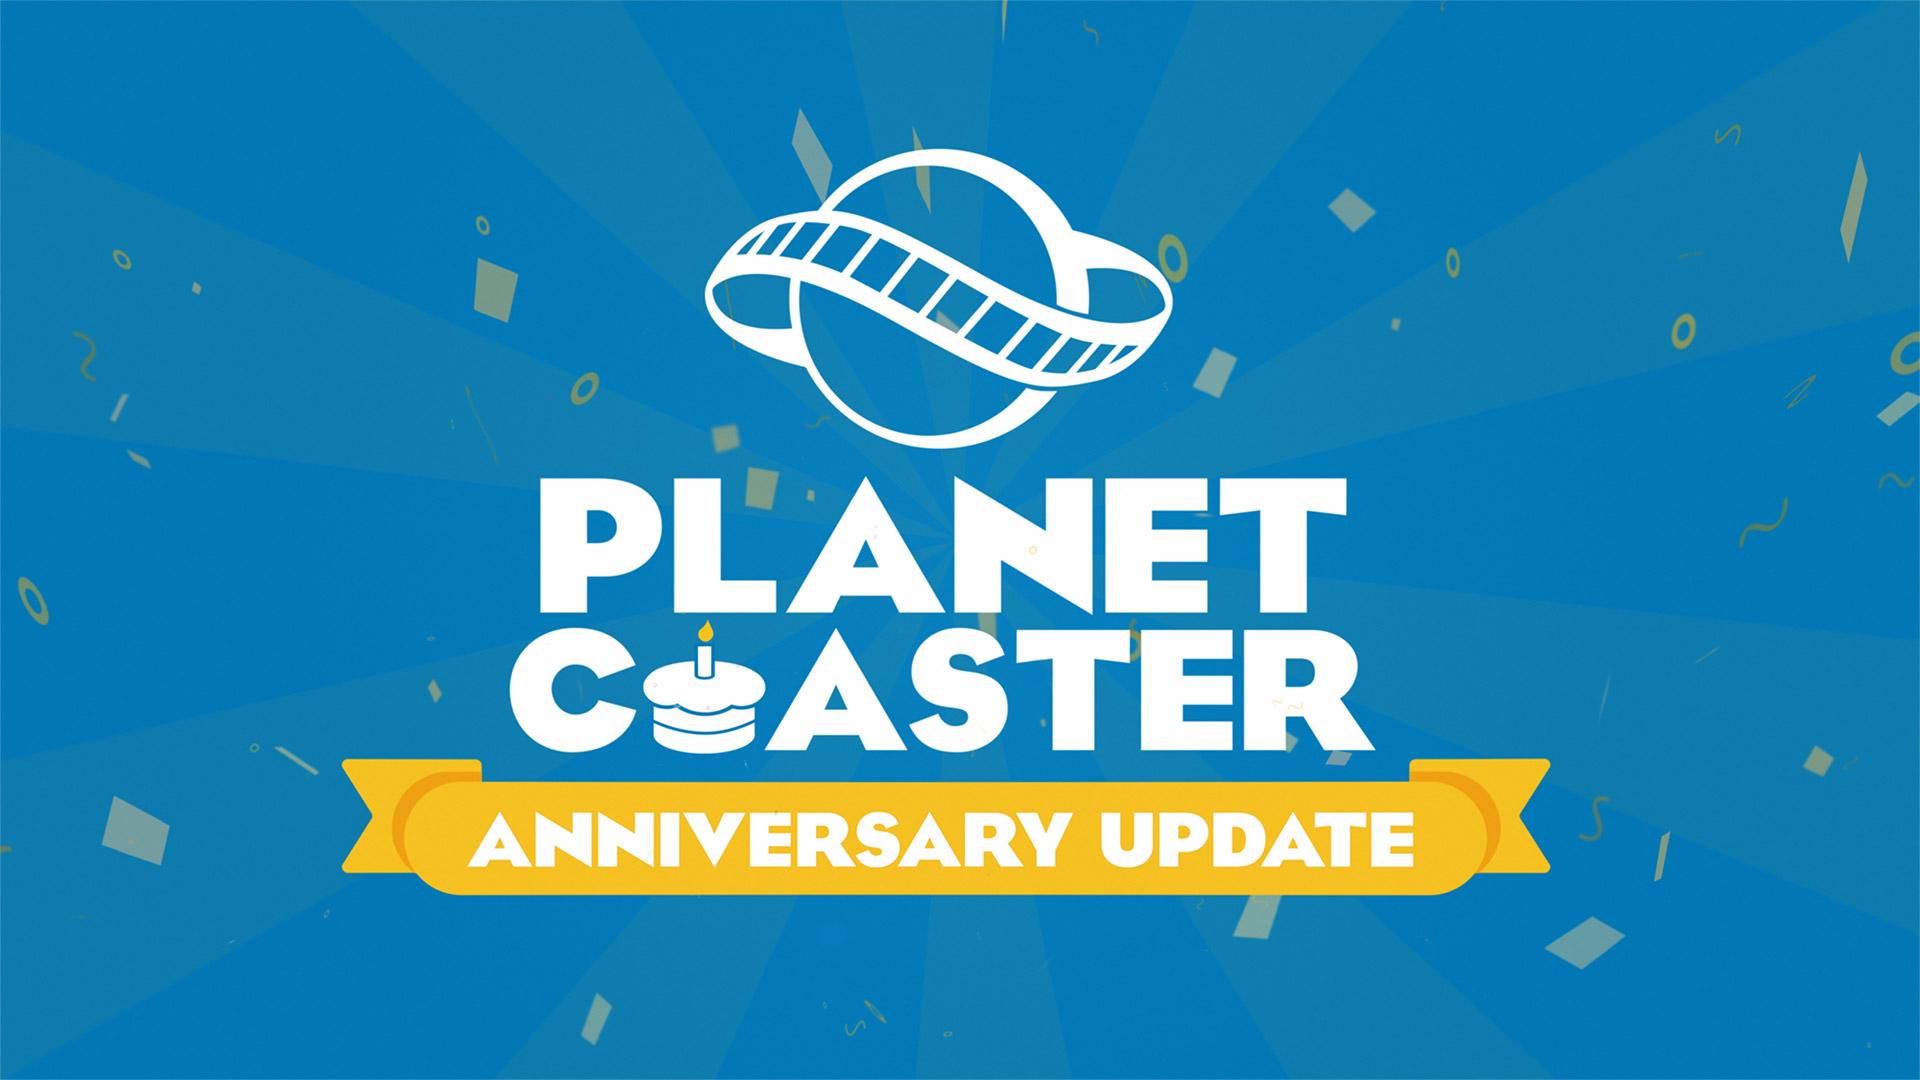 www.planetcoaster.com